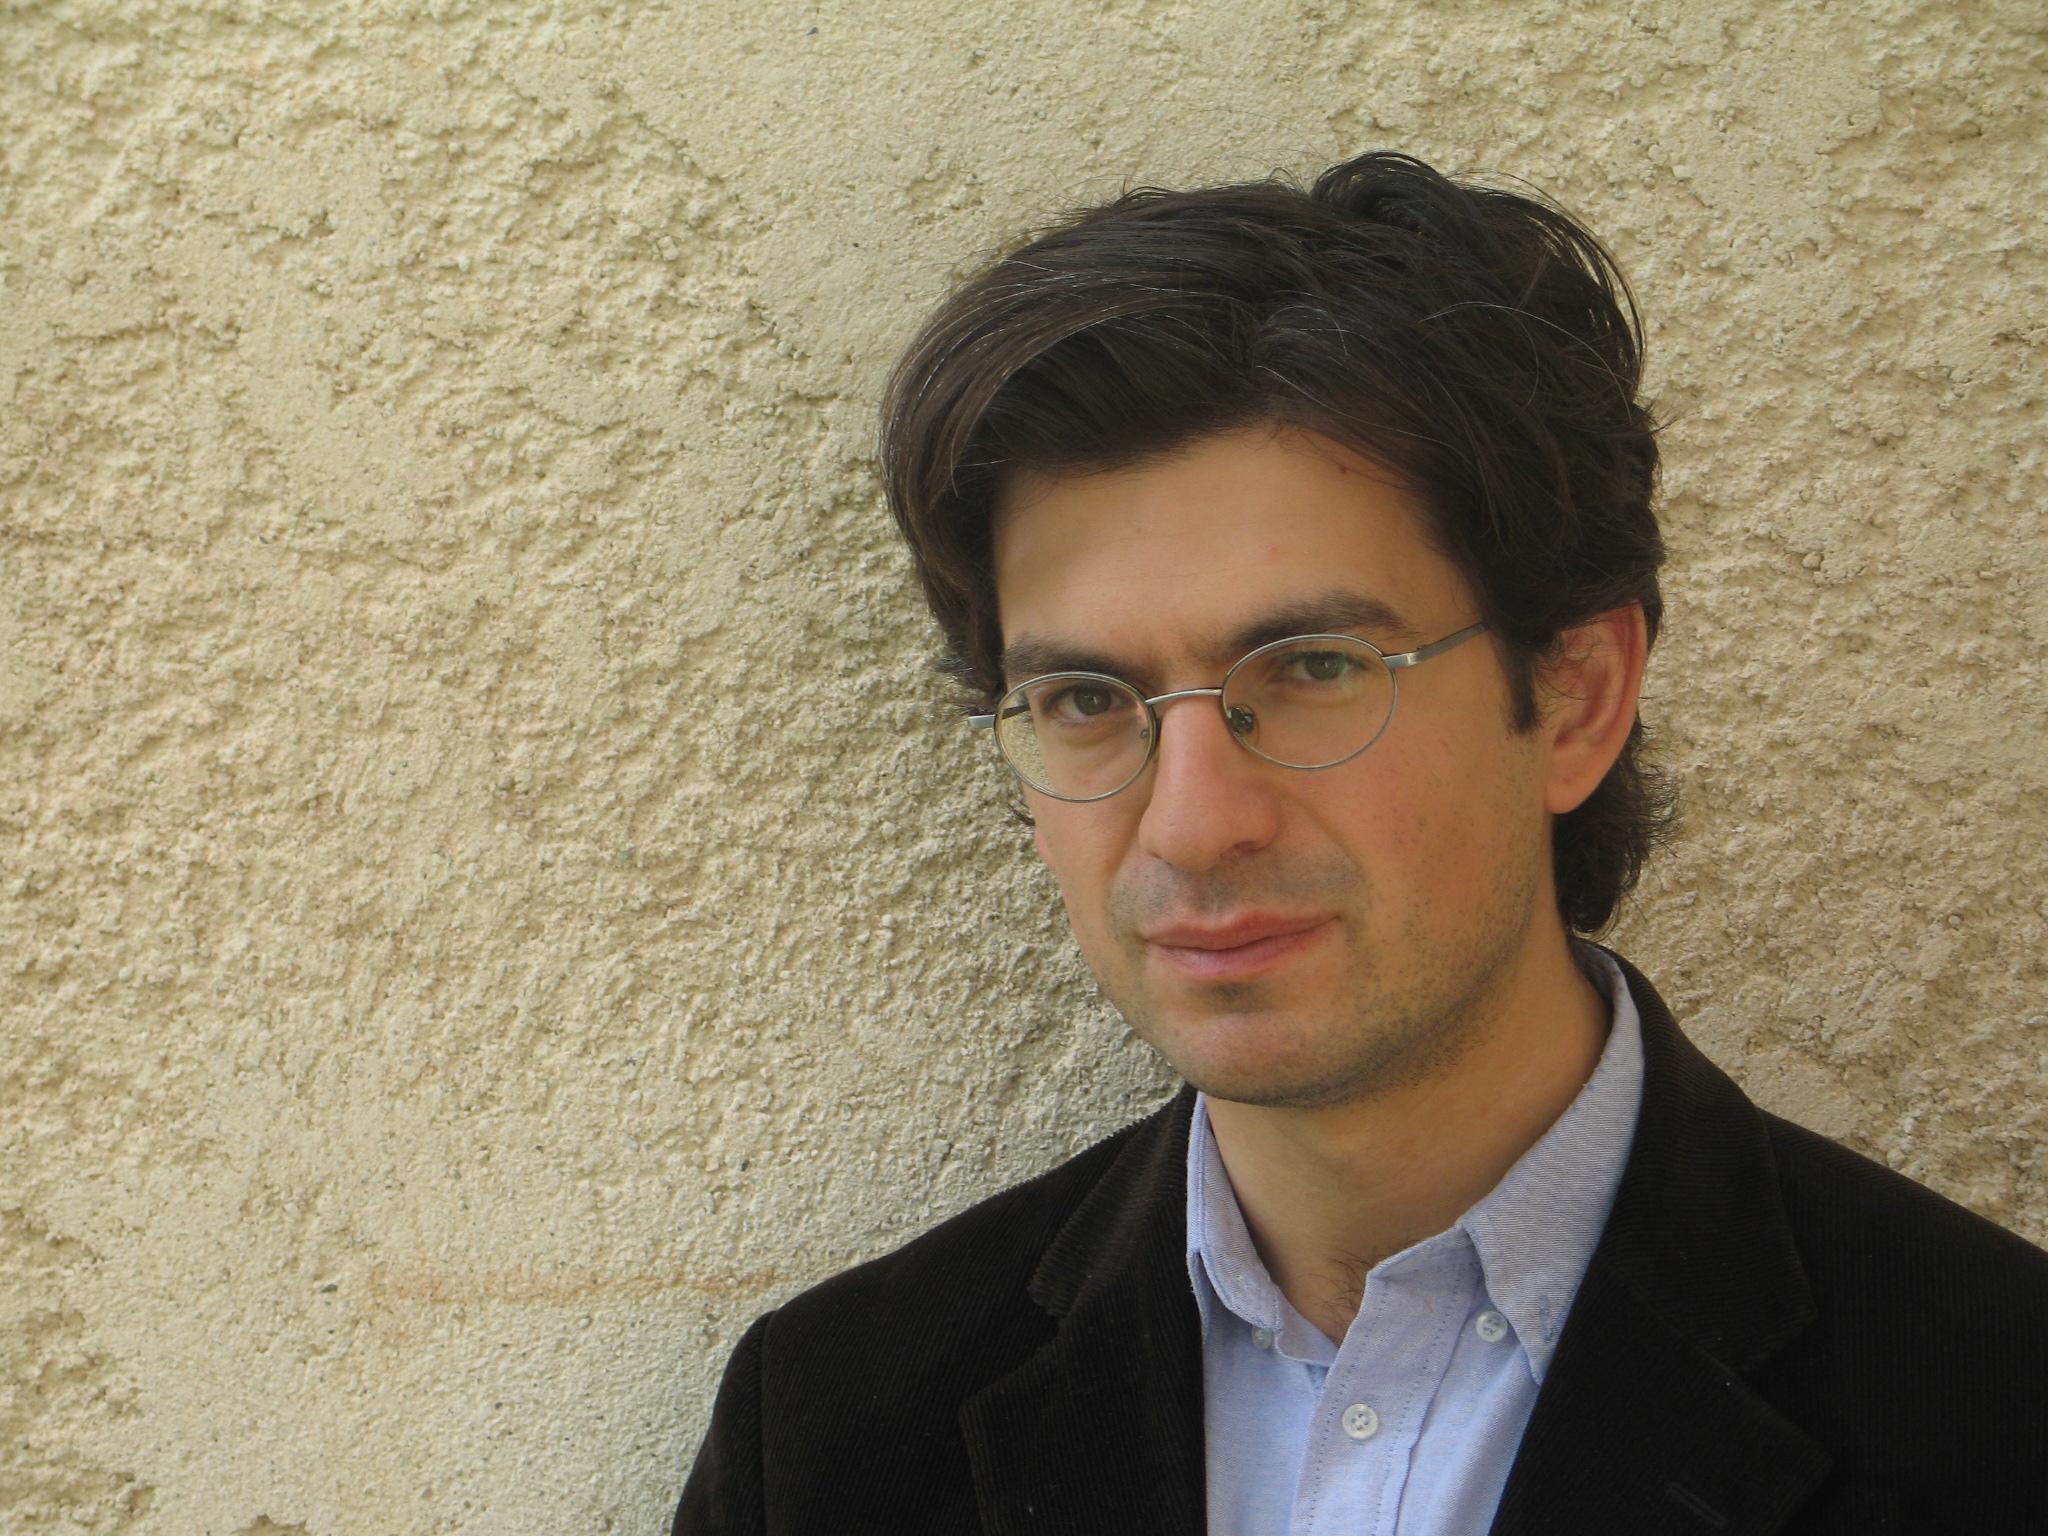 http://upload.wikimedia.org/wikipedia/commons/4/42/Fabrice_Hadjadj.jpg